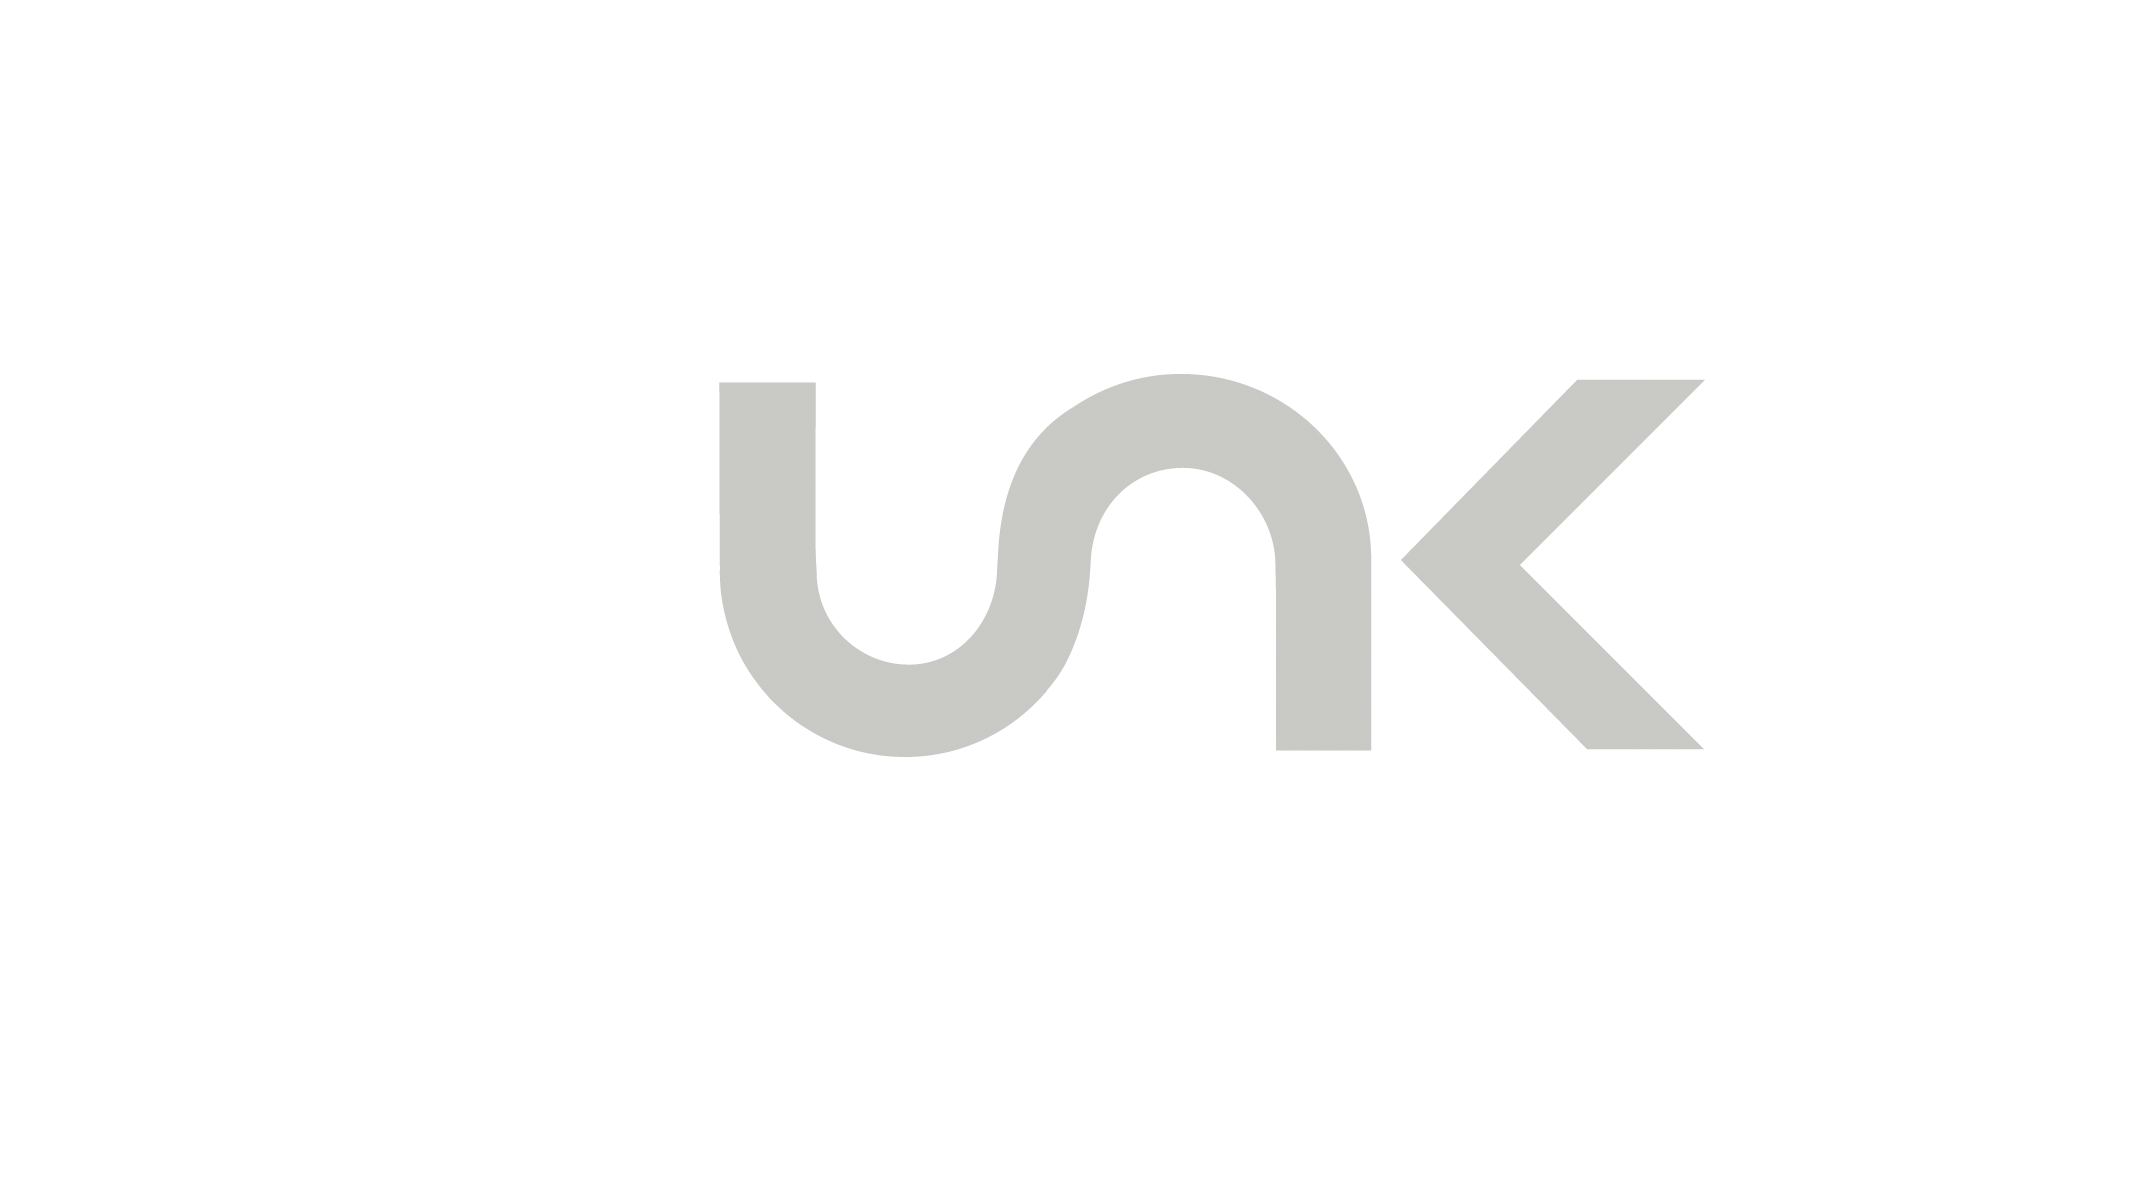 Stephan Klotz logo